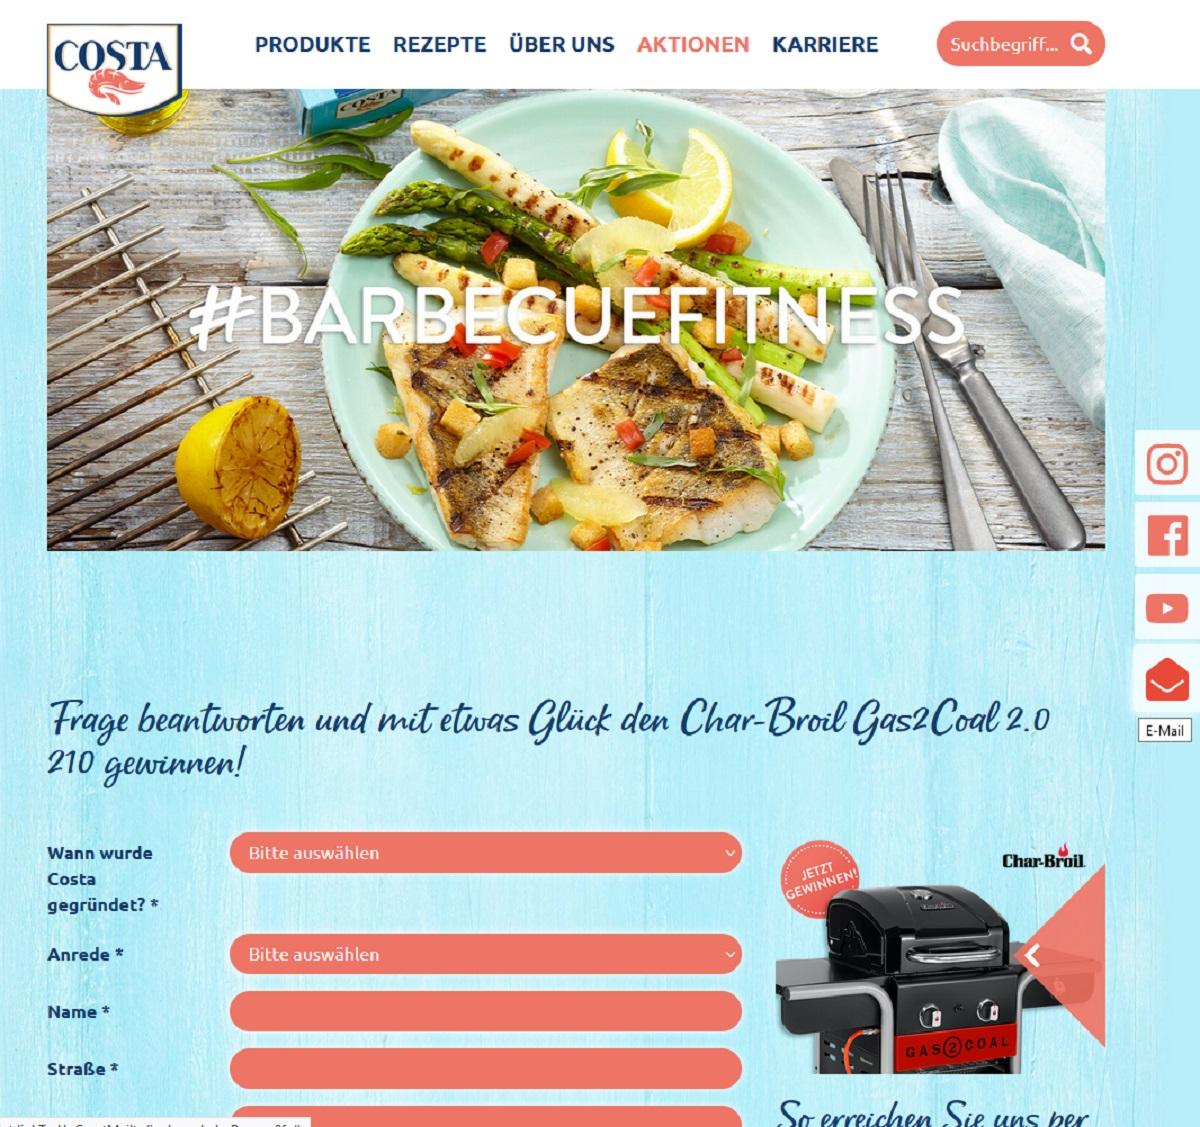 Jetzt Char-Broil Gas2Coal Grill gewinnen COSTA Gewinnspiel